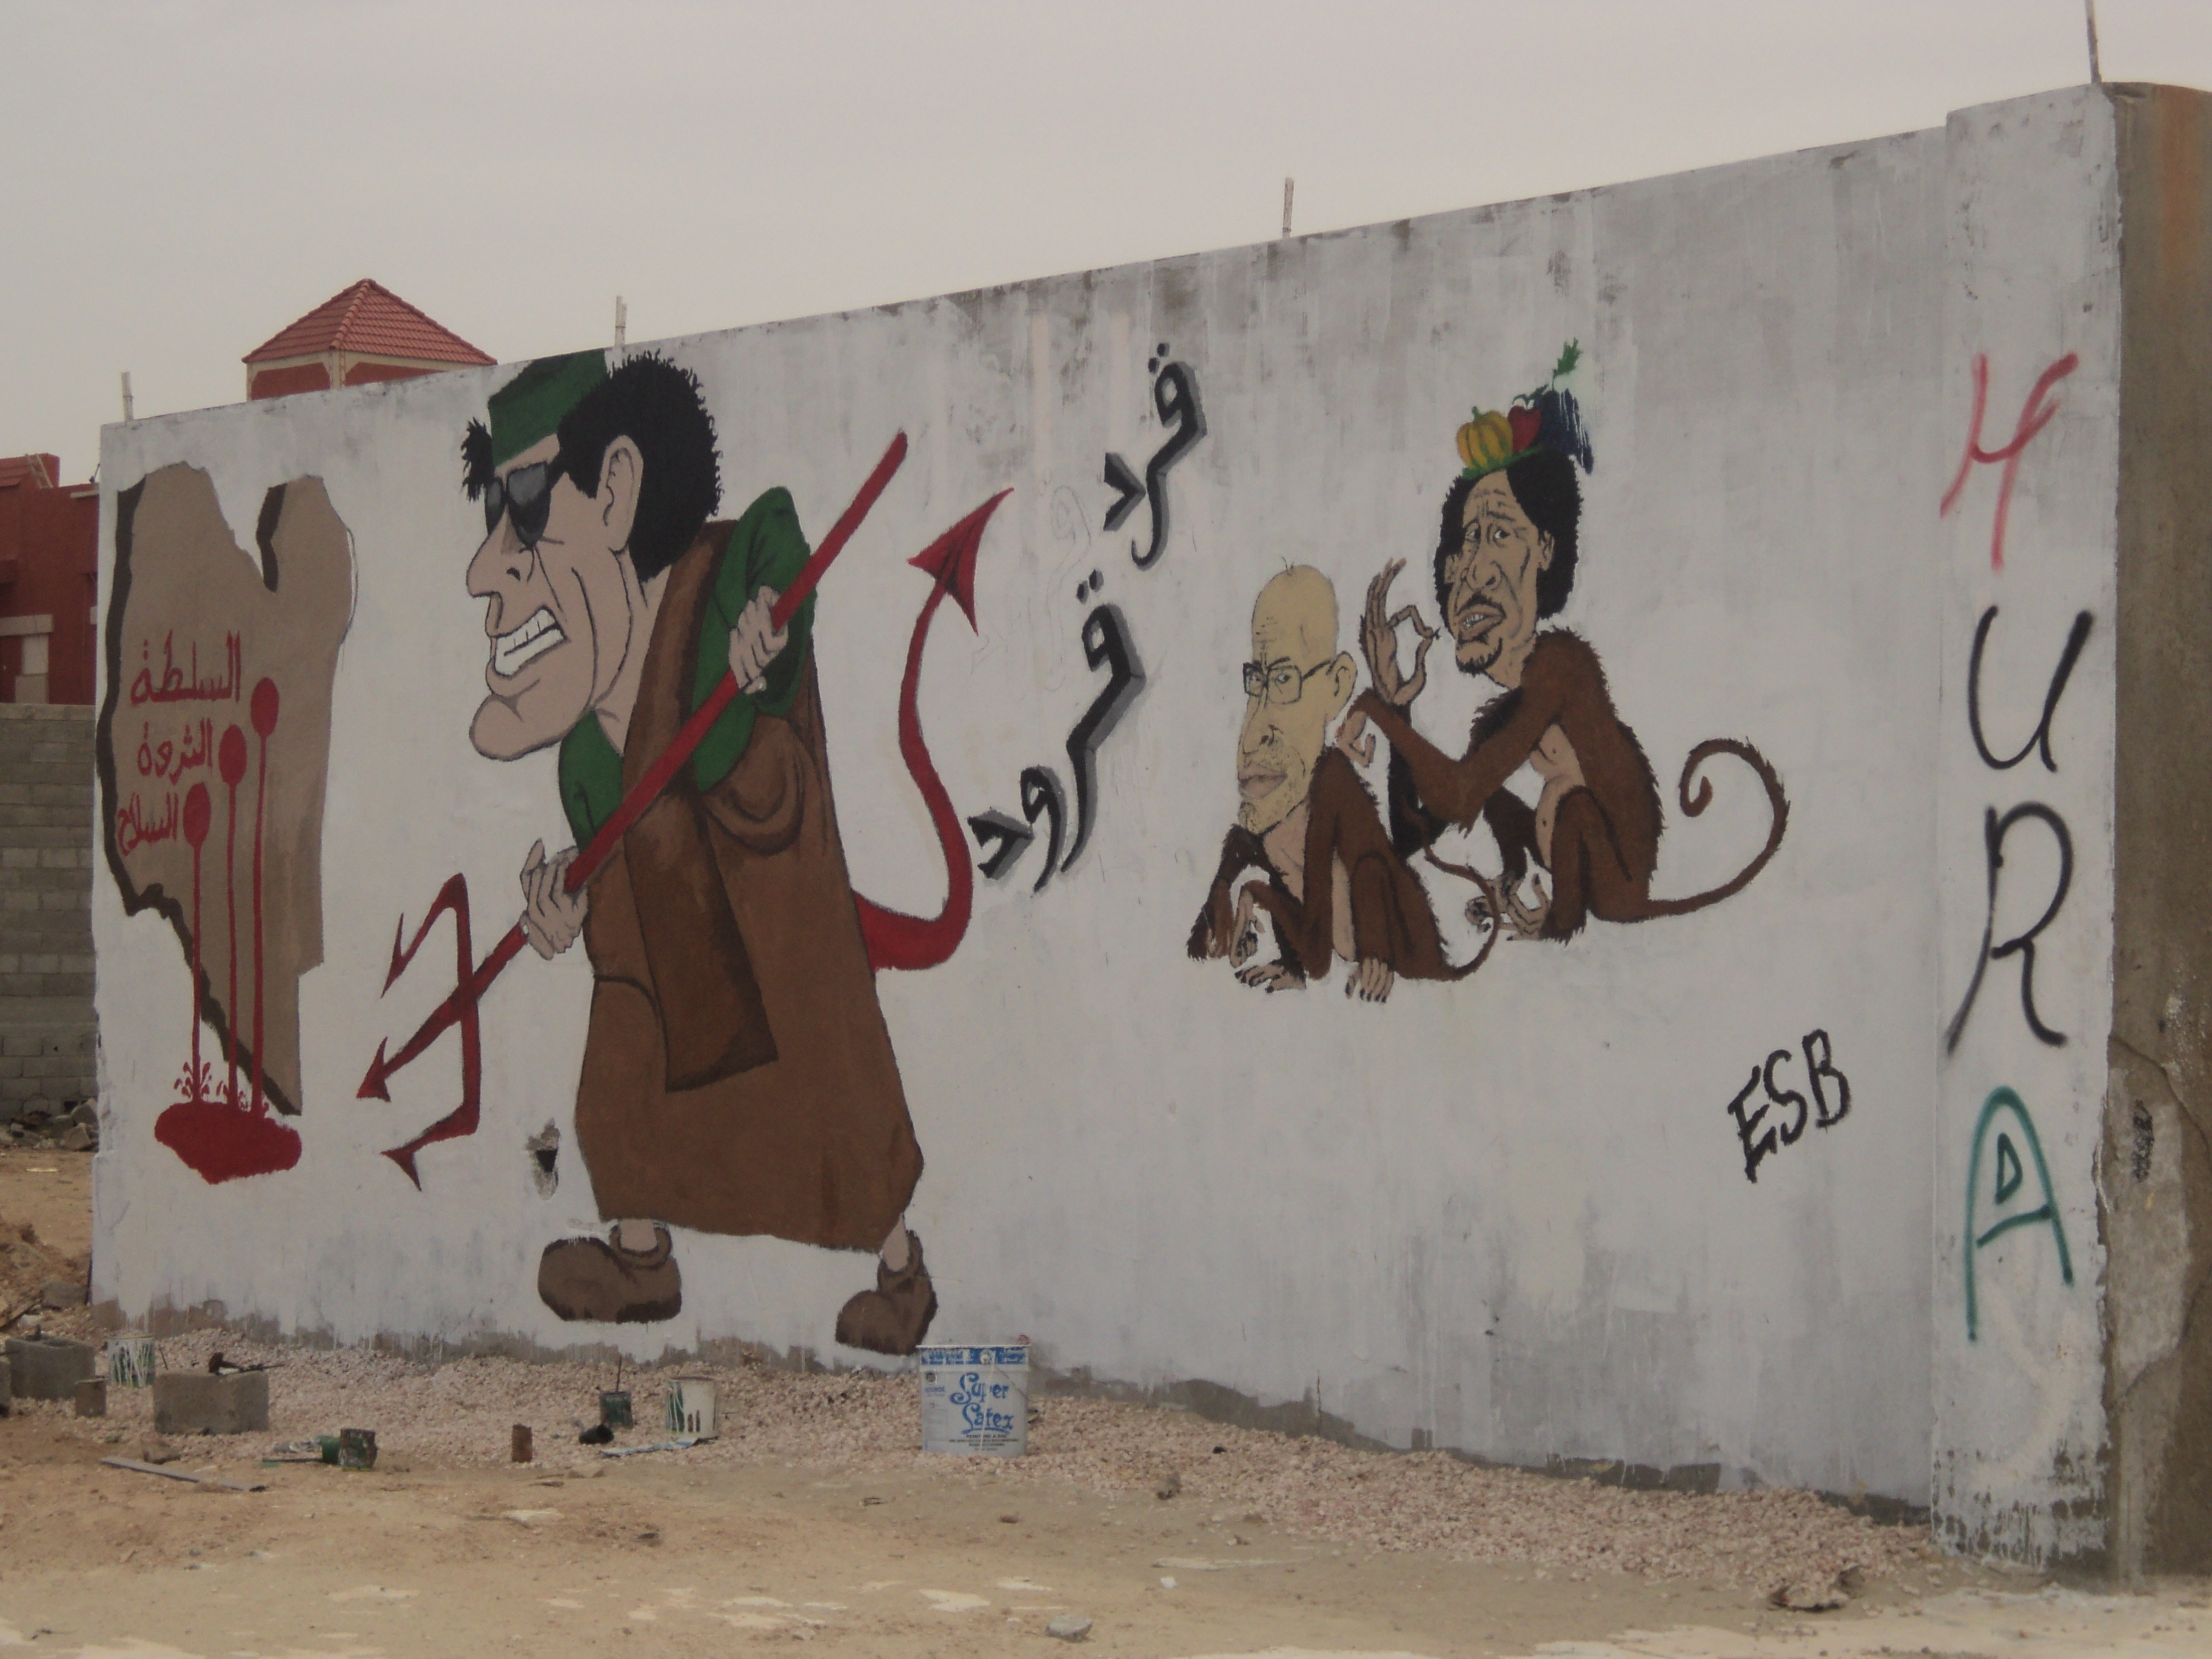 Benghazi caricatures of Gadafi